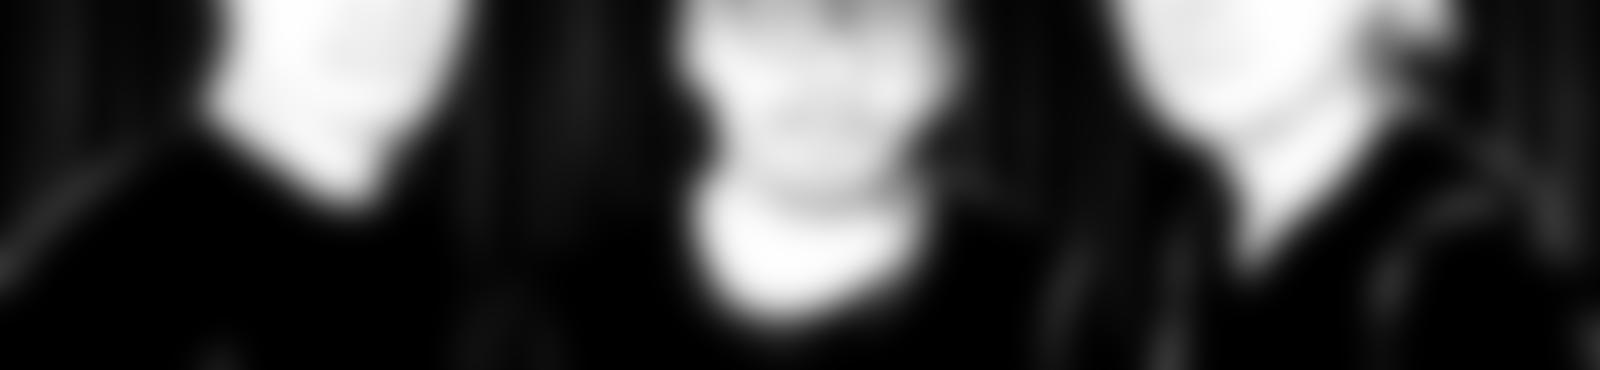 Blurred c1385802 978c 4786 be7b c846ca34005b